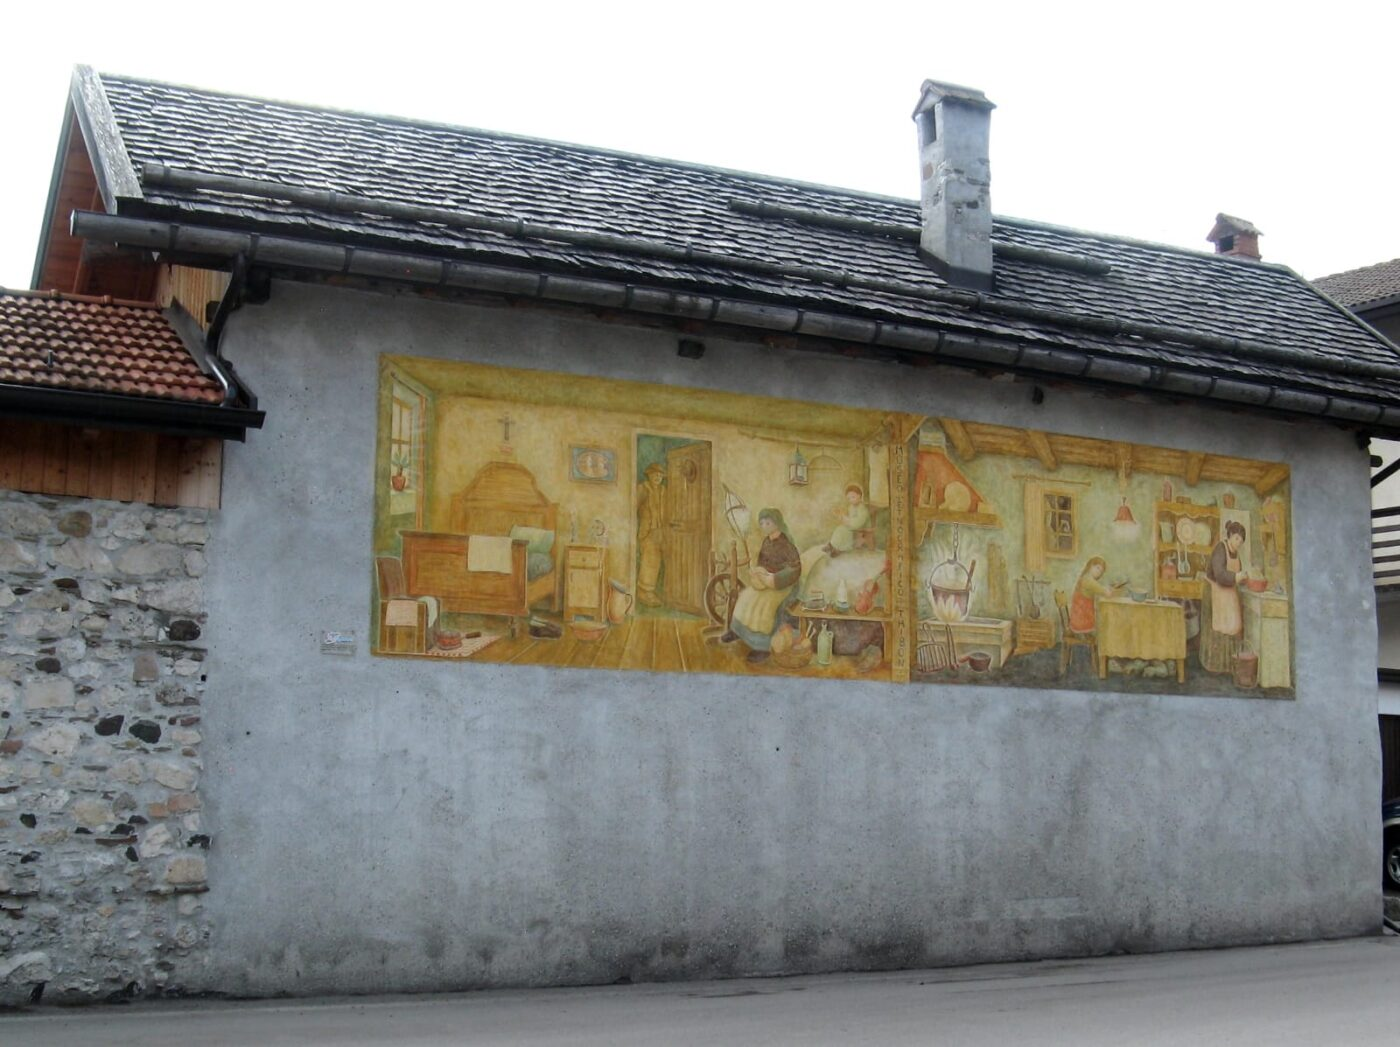 Museo Etnografico - Taibon Agordino